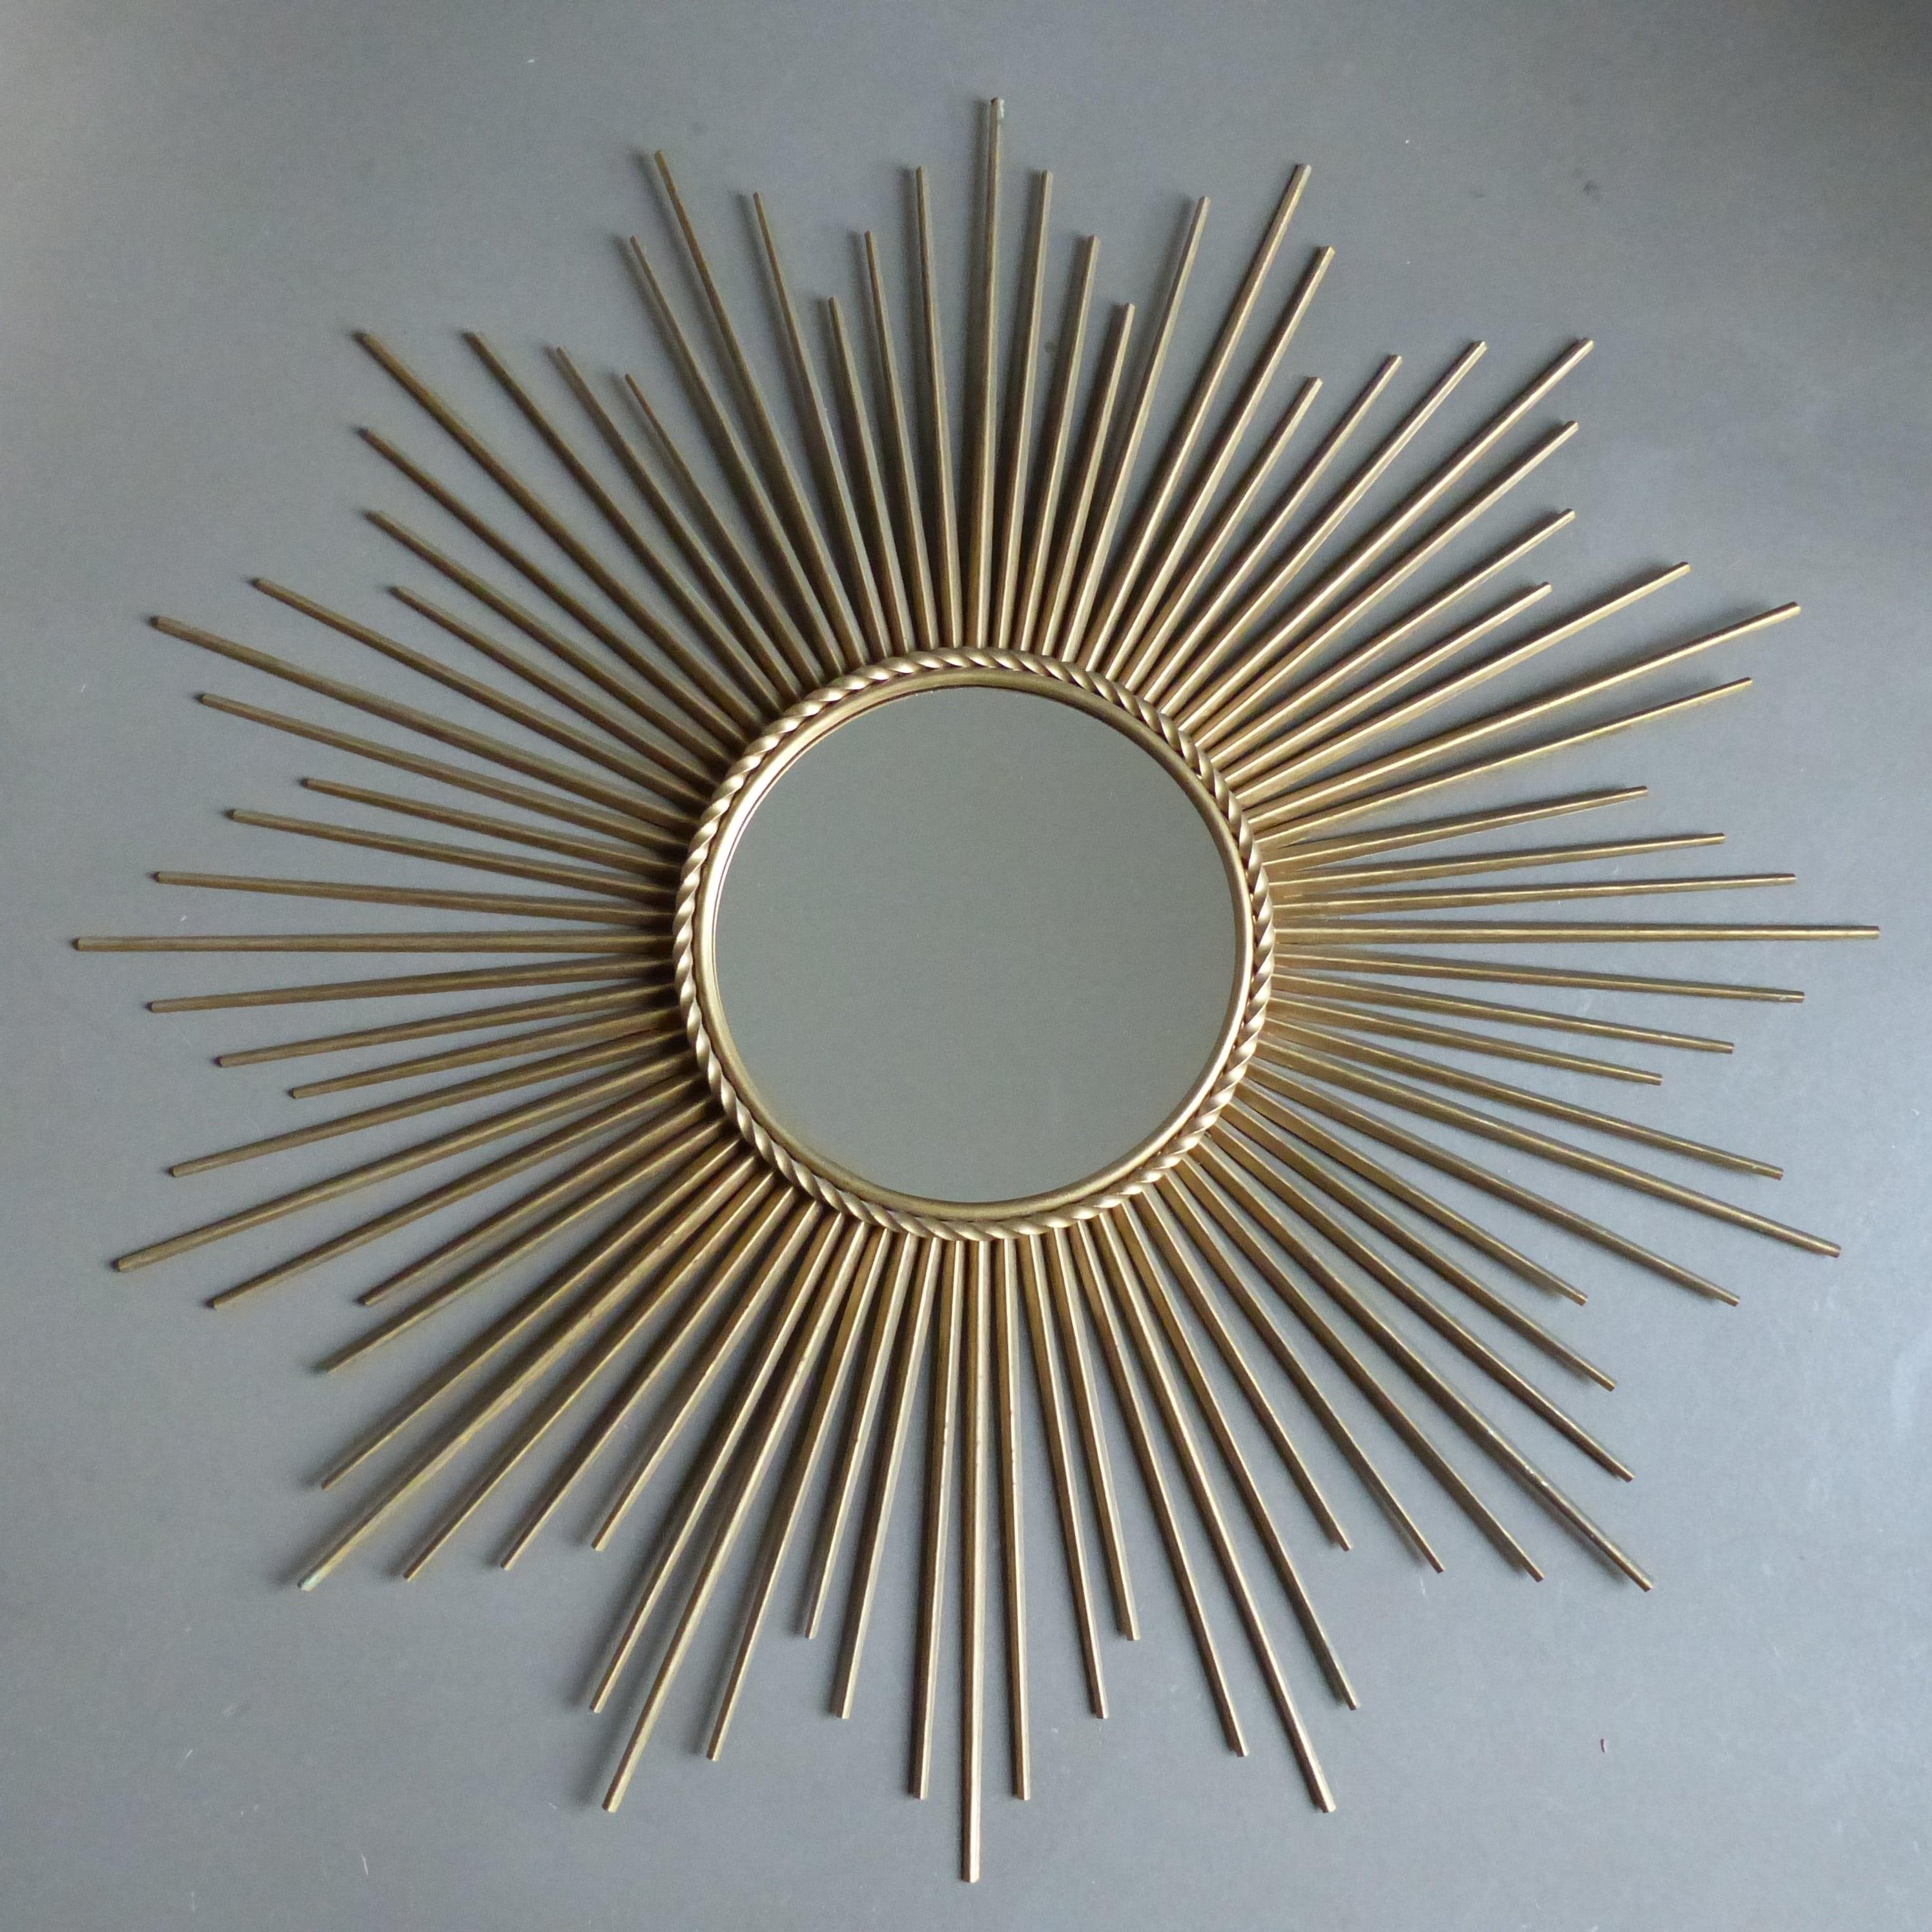 Grand miroir chaty vallauris lignedebrocante brocante en for Chaty vallauris miroir